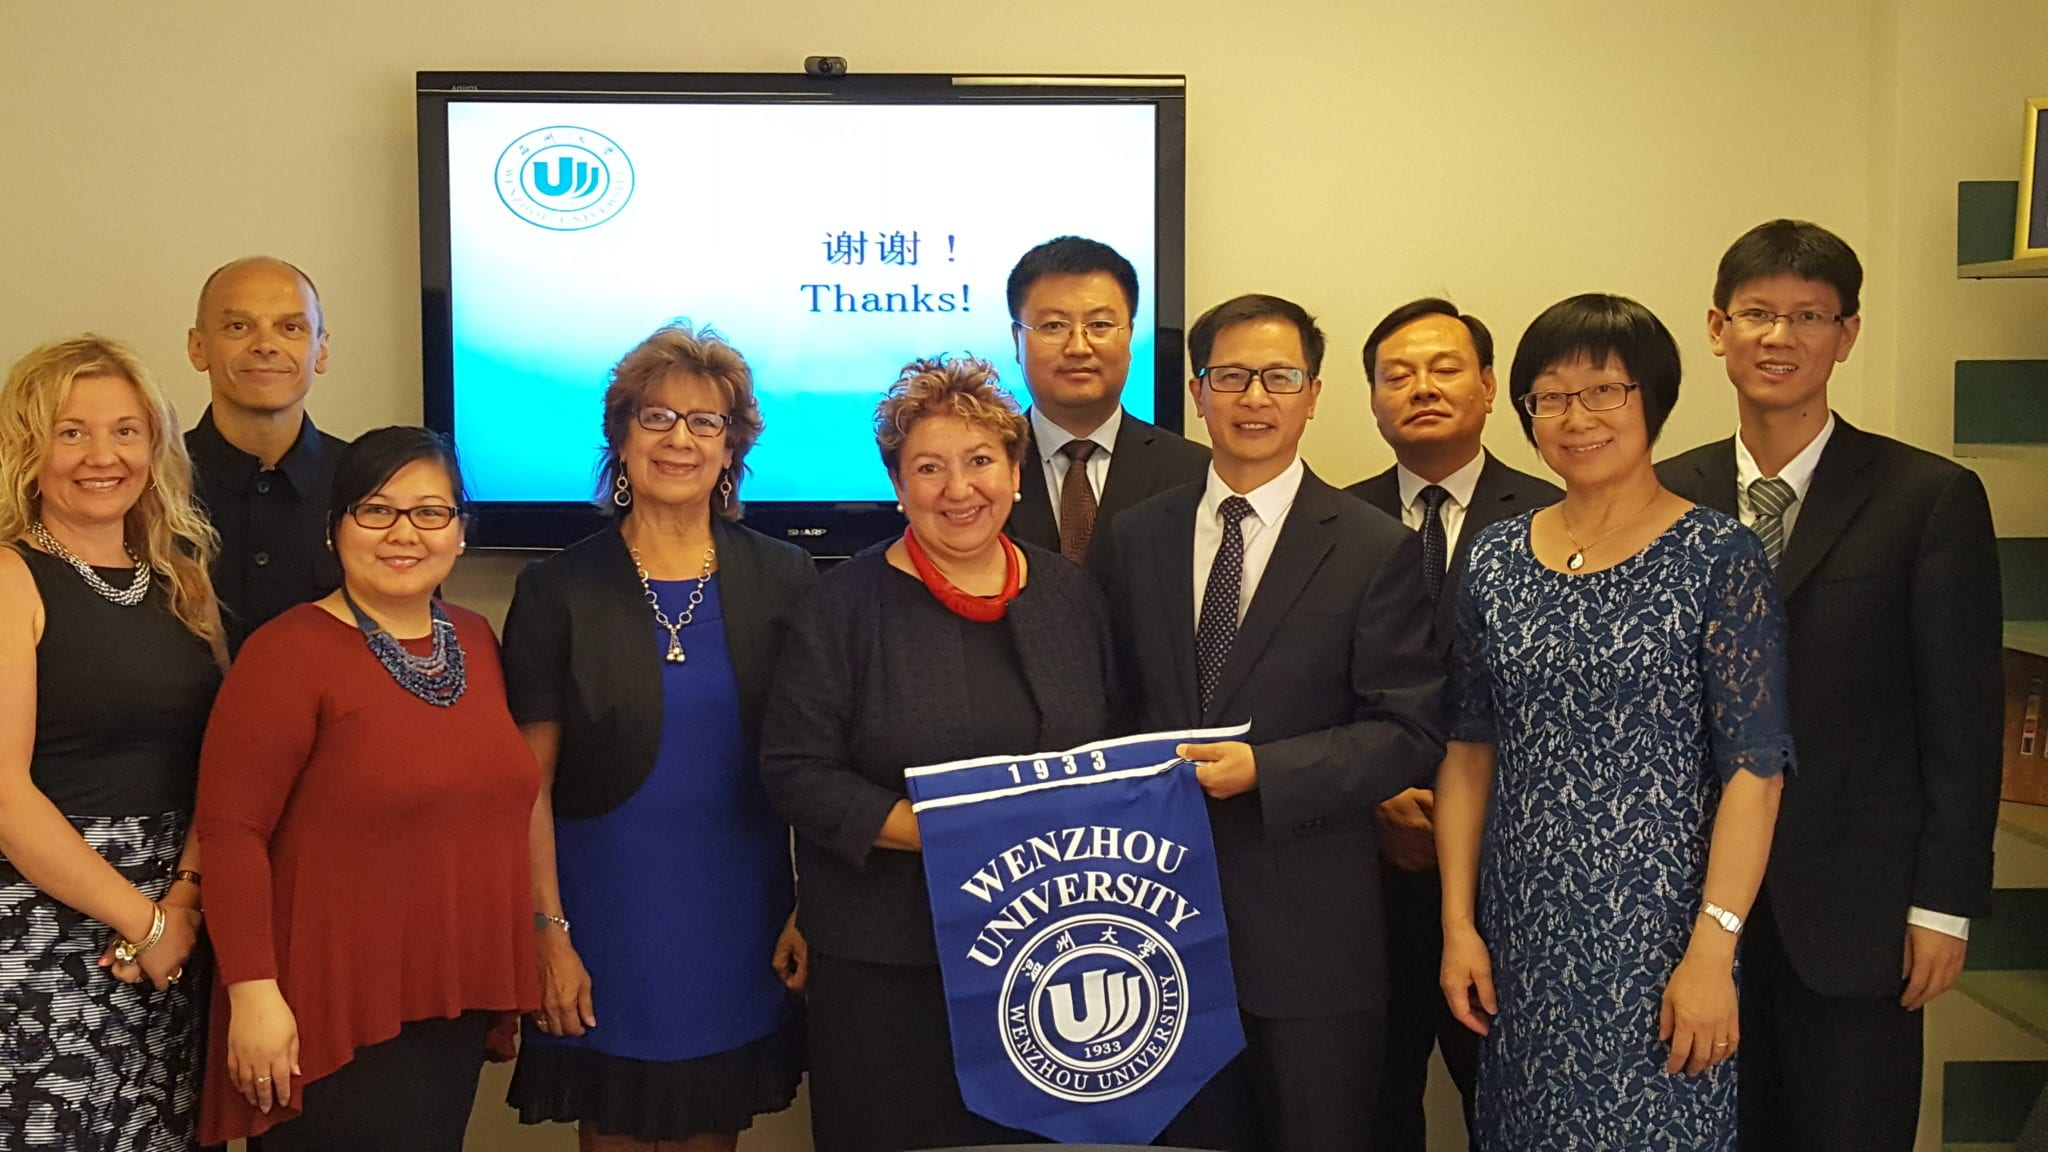 Wenzhou University, LA&PS and York International, July 2017